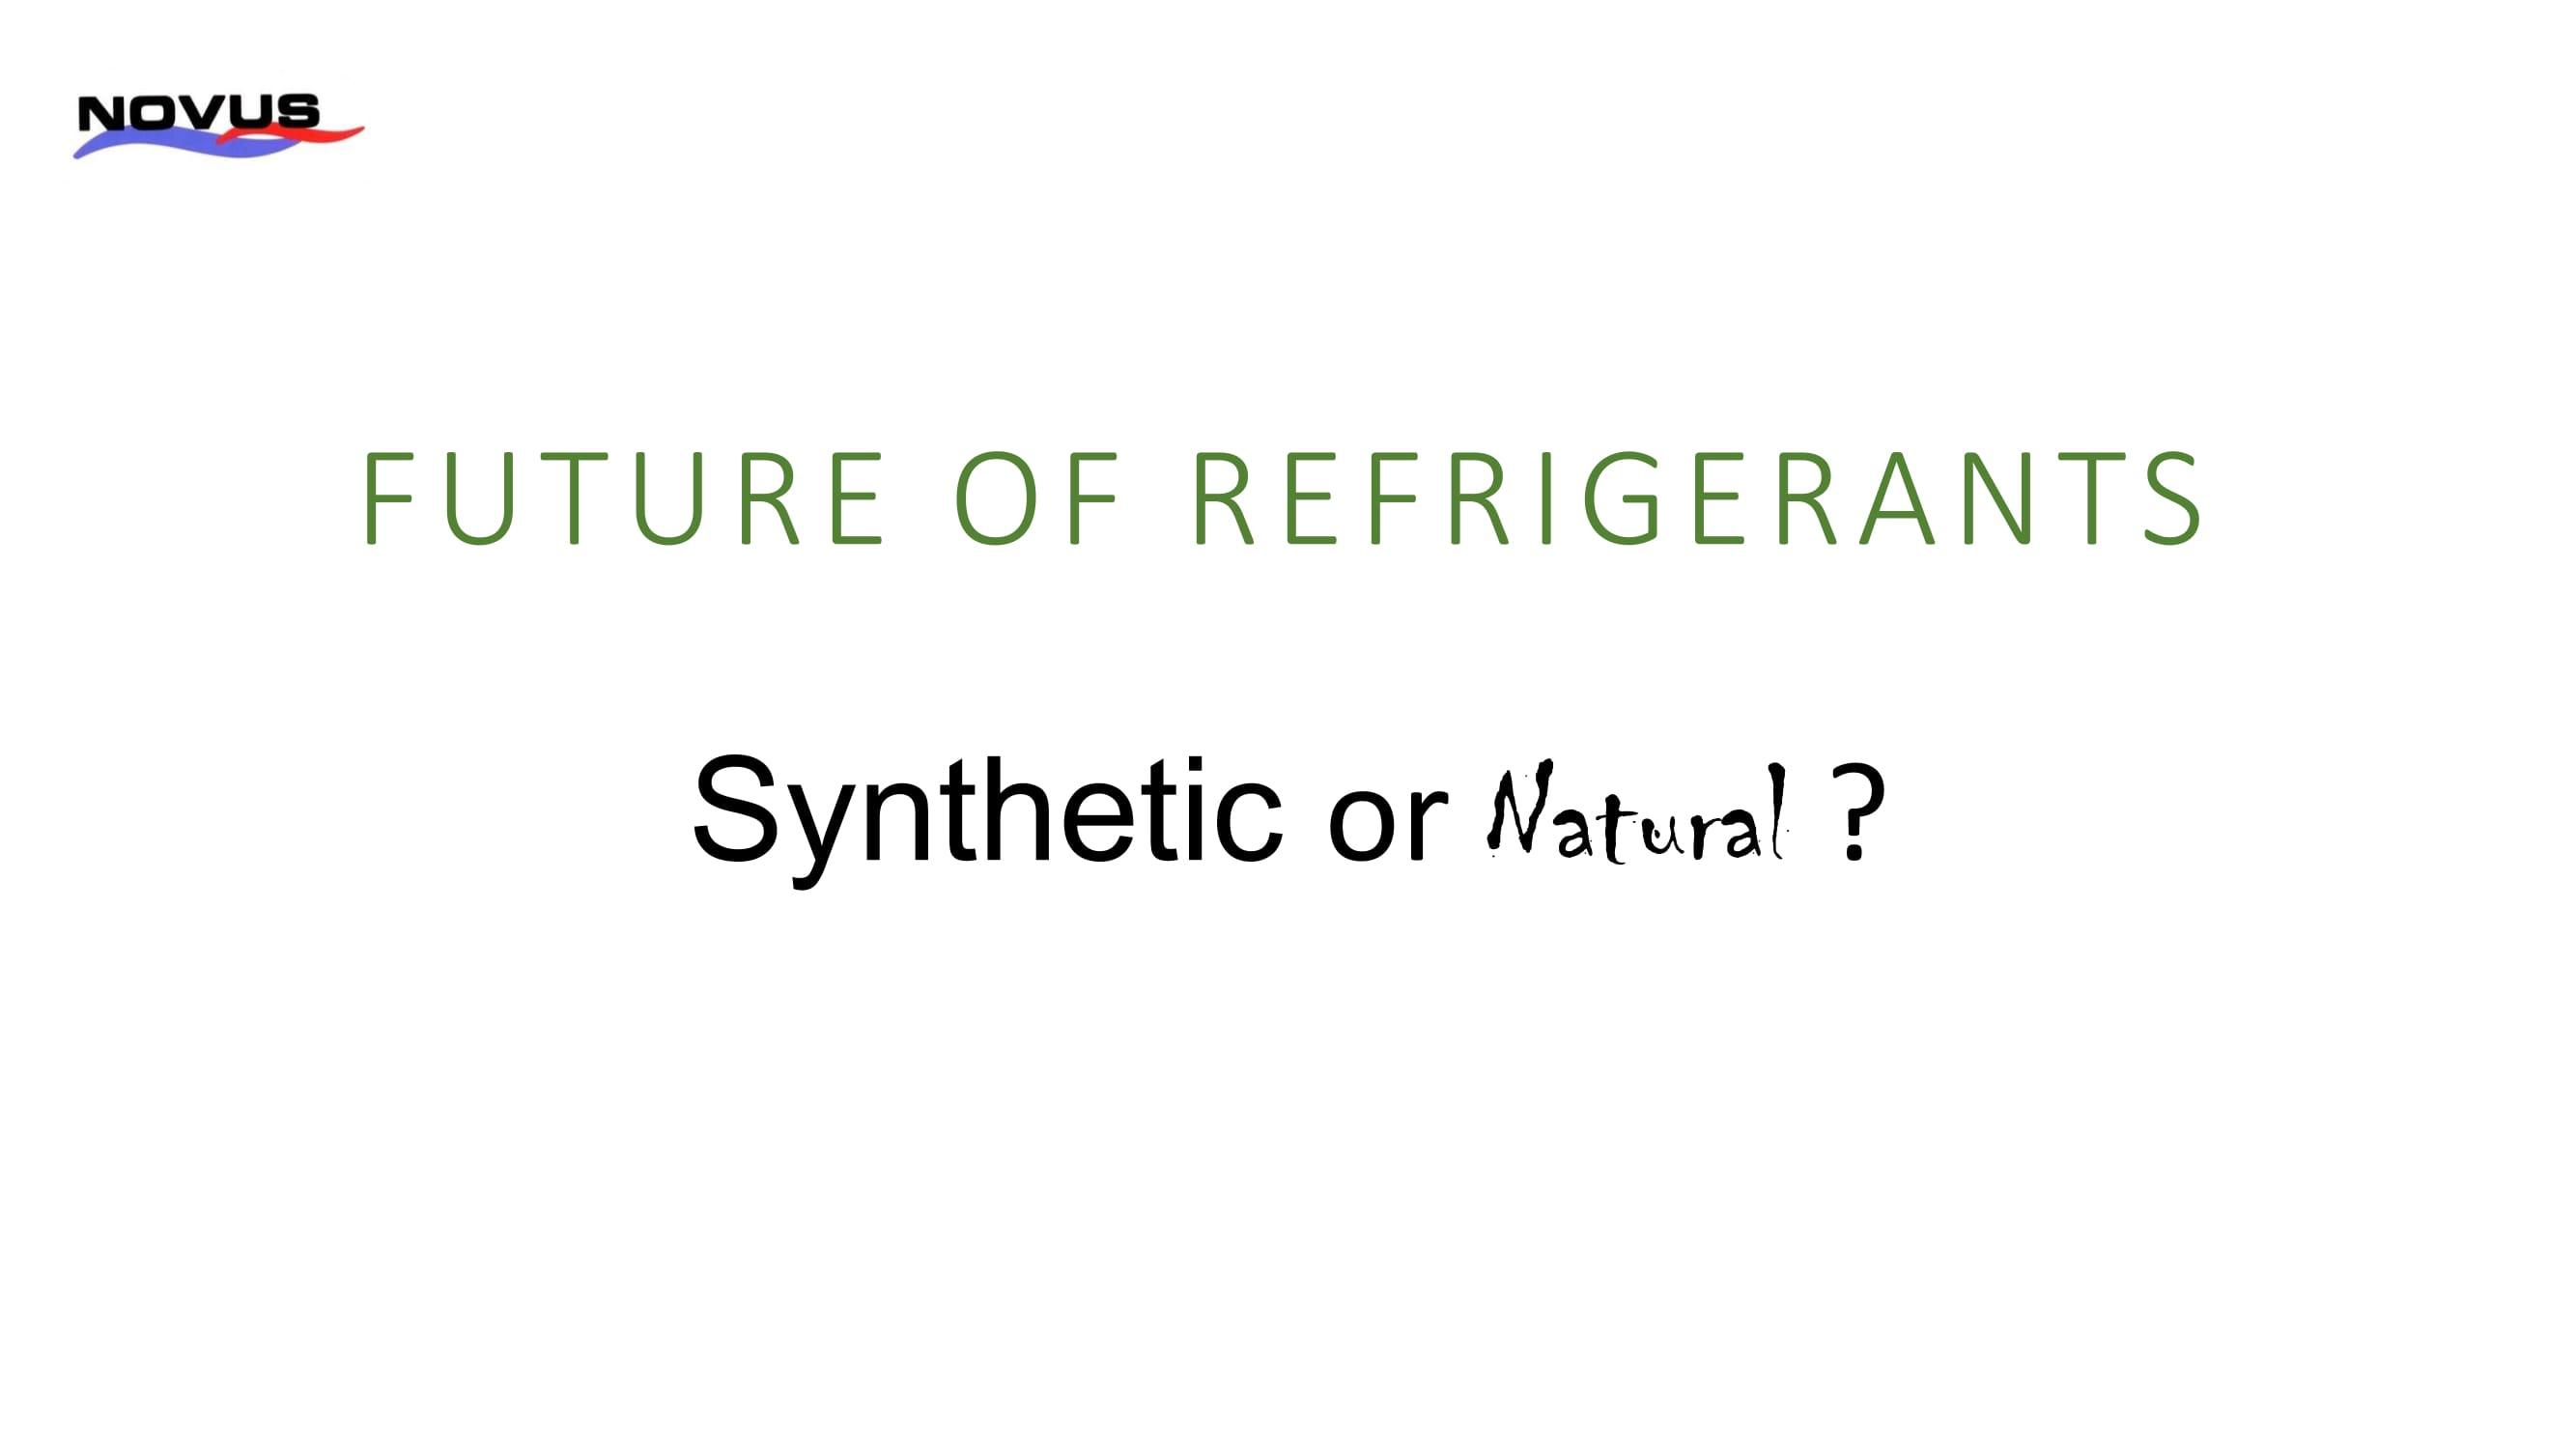 FUTURE OF REFRIGERANTS 1-01